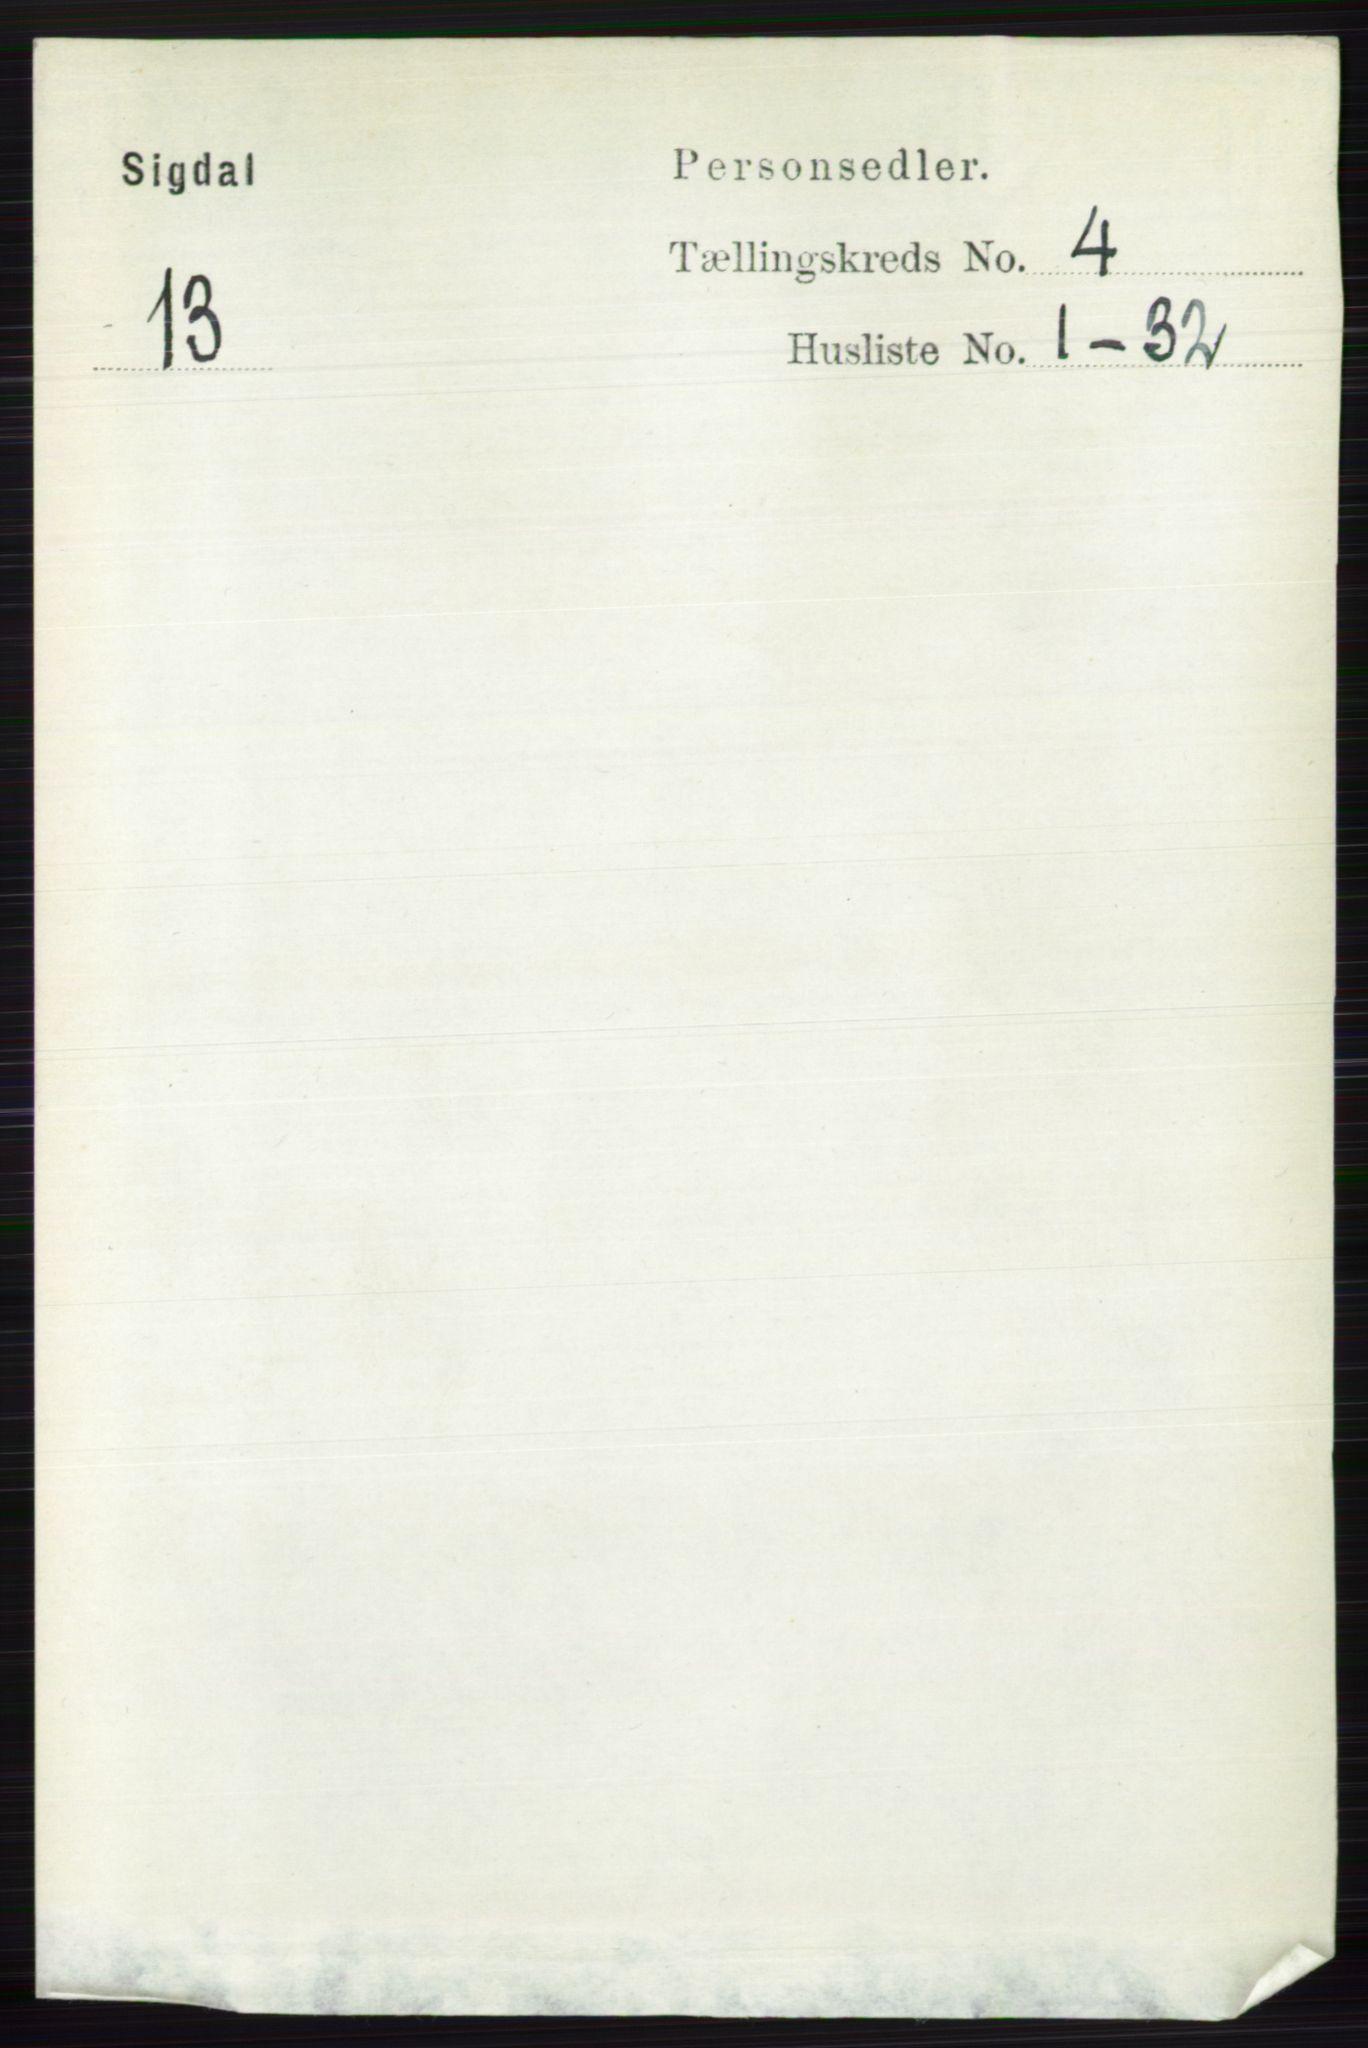 RA, Folketelling 1891 for 0621 Sigdal herred, 1891, s. 1650